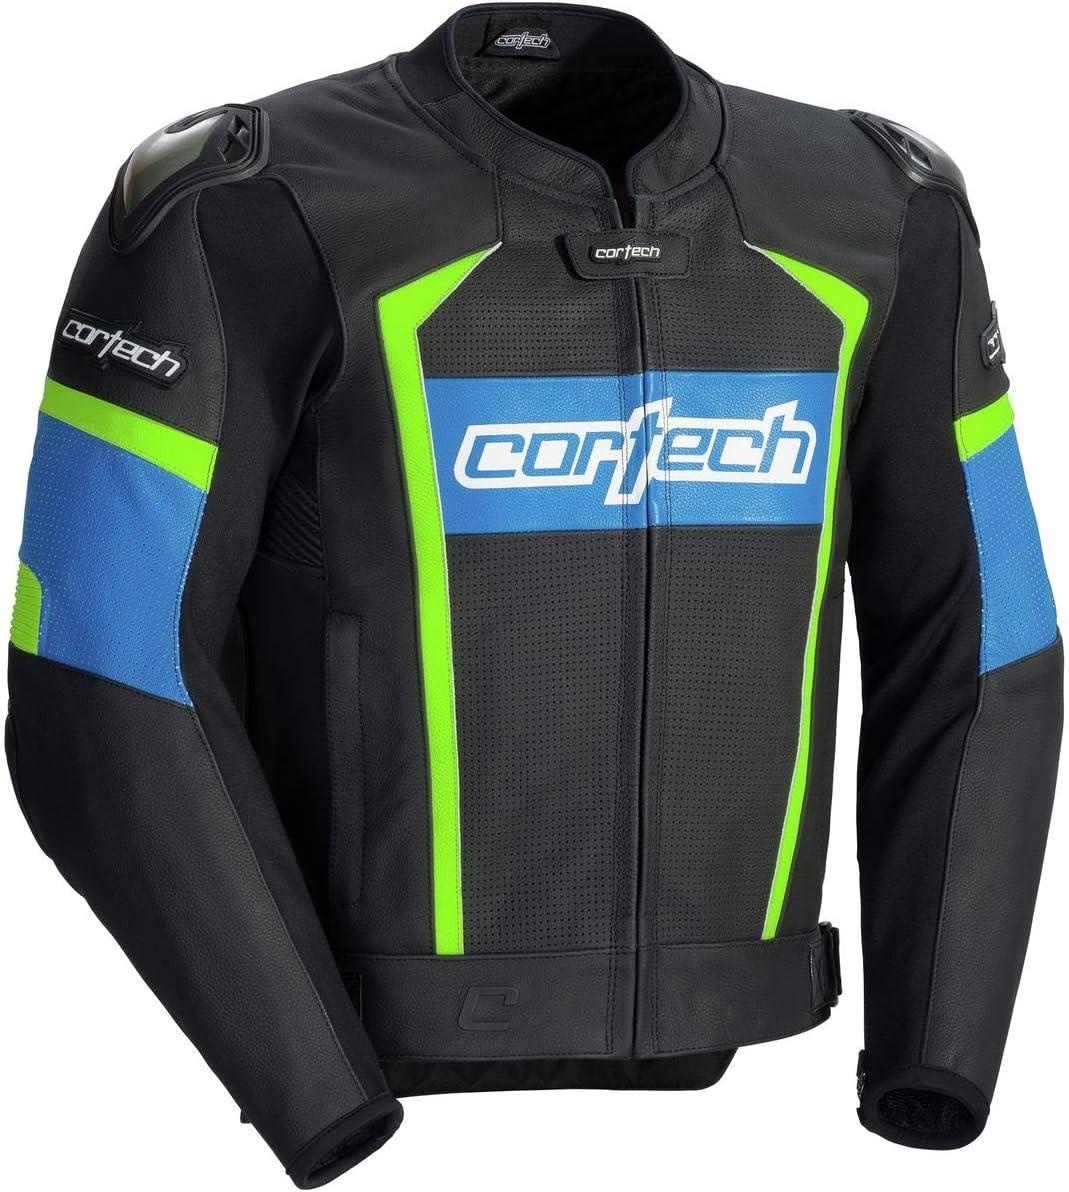 Cortech Adrenaline Sports Bike Racing Motorcycle Jacket